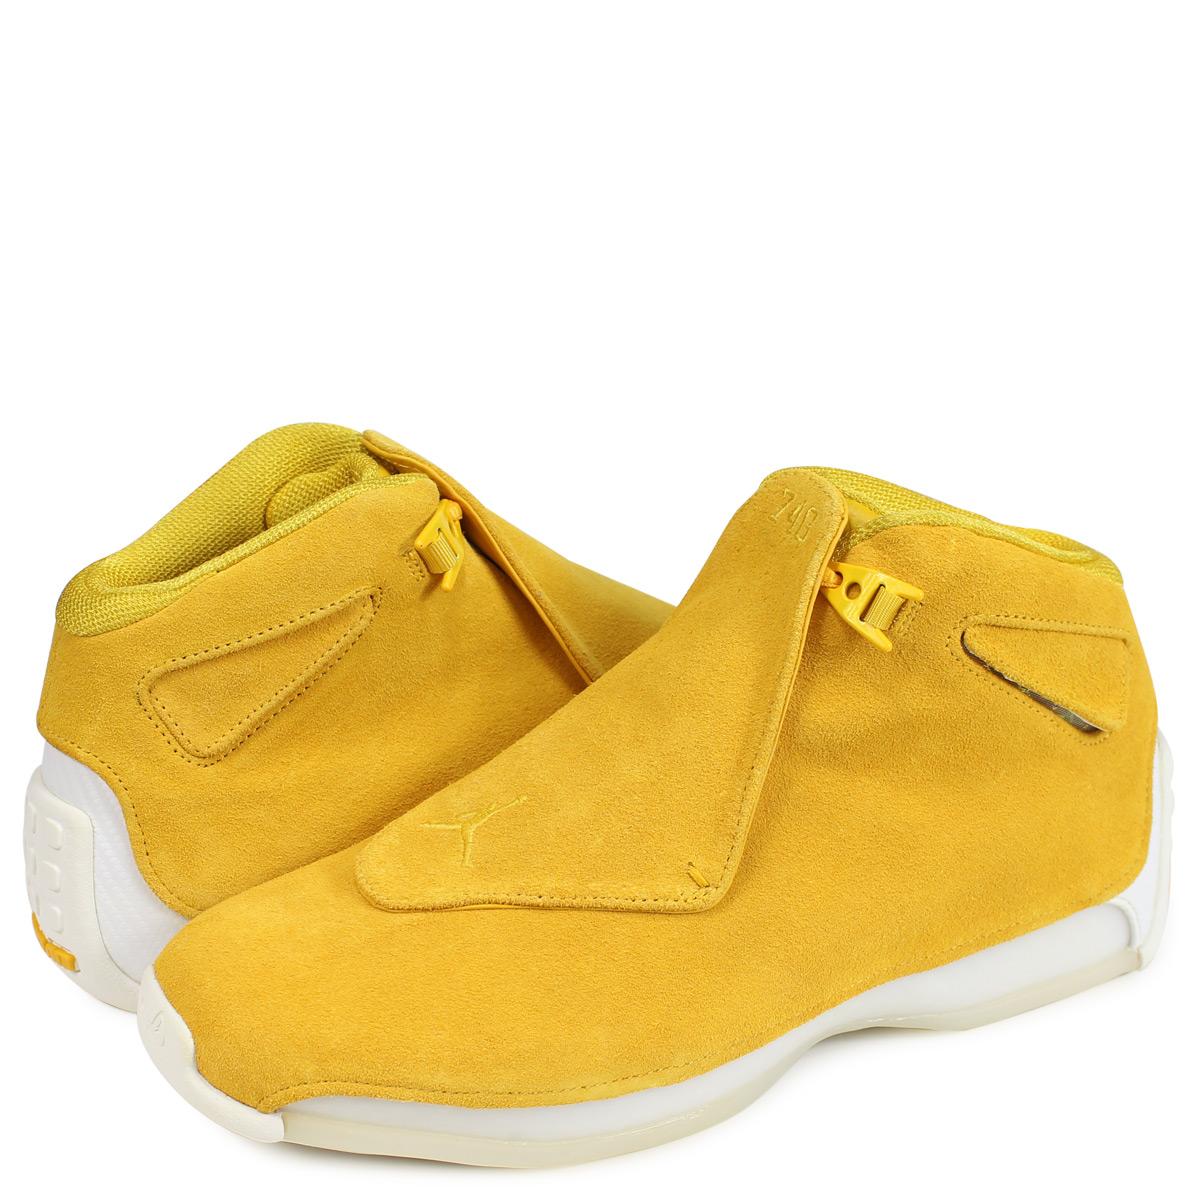 size 40 50137 801fb Nike NIKE Air Jordan 18 nostalgic sneakers men AIR JORDAN 18 RETRO yellow  AA2494-701